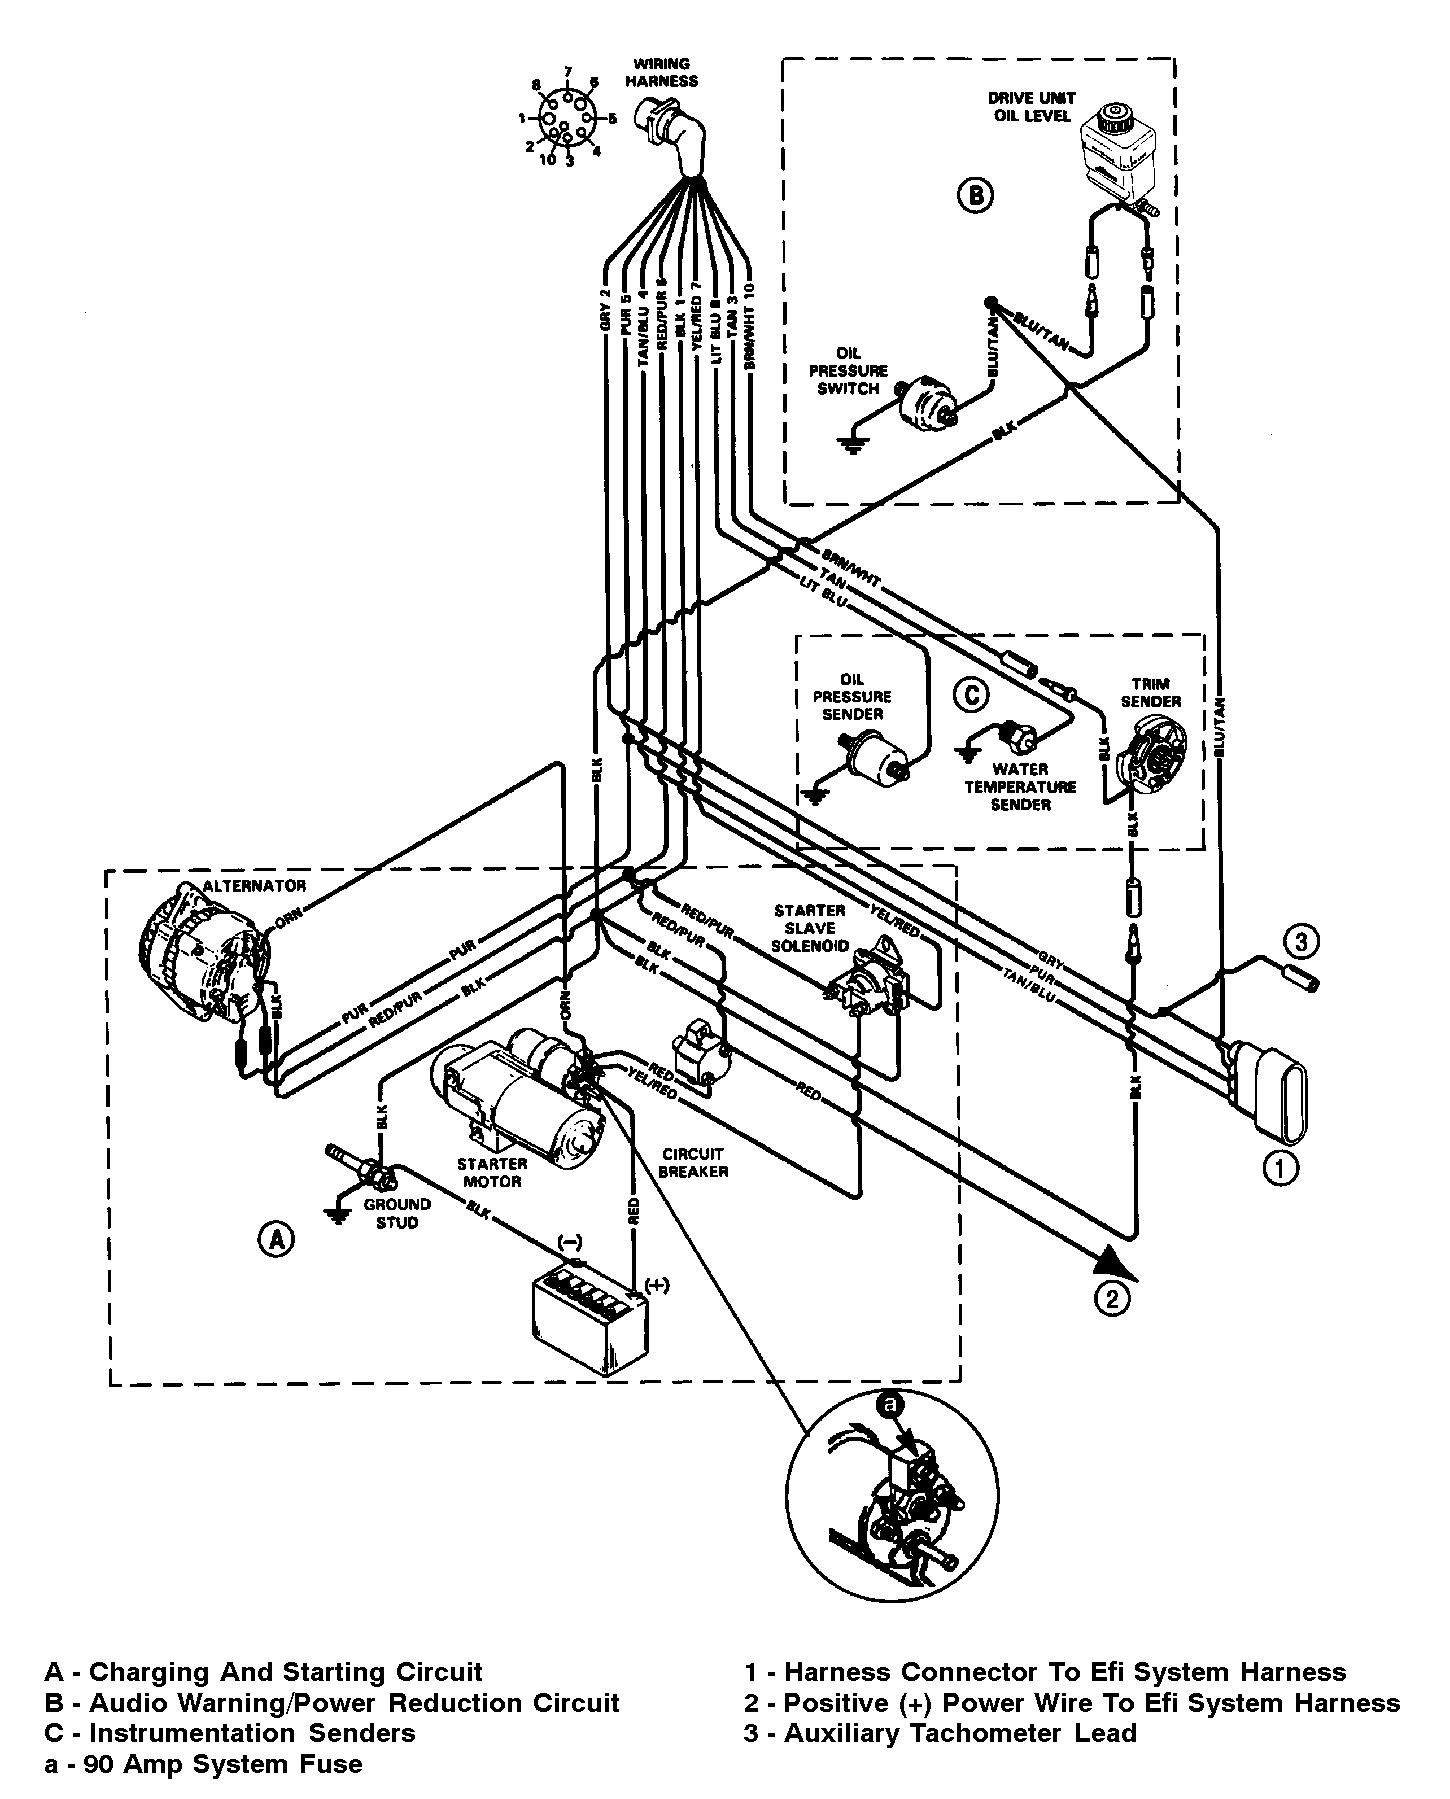 Astounding Mitsubishi Alternator Wiring Diagram Images - Schematic ...